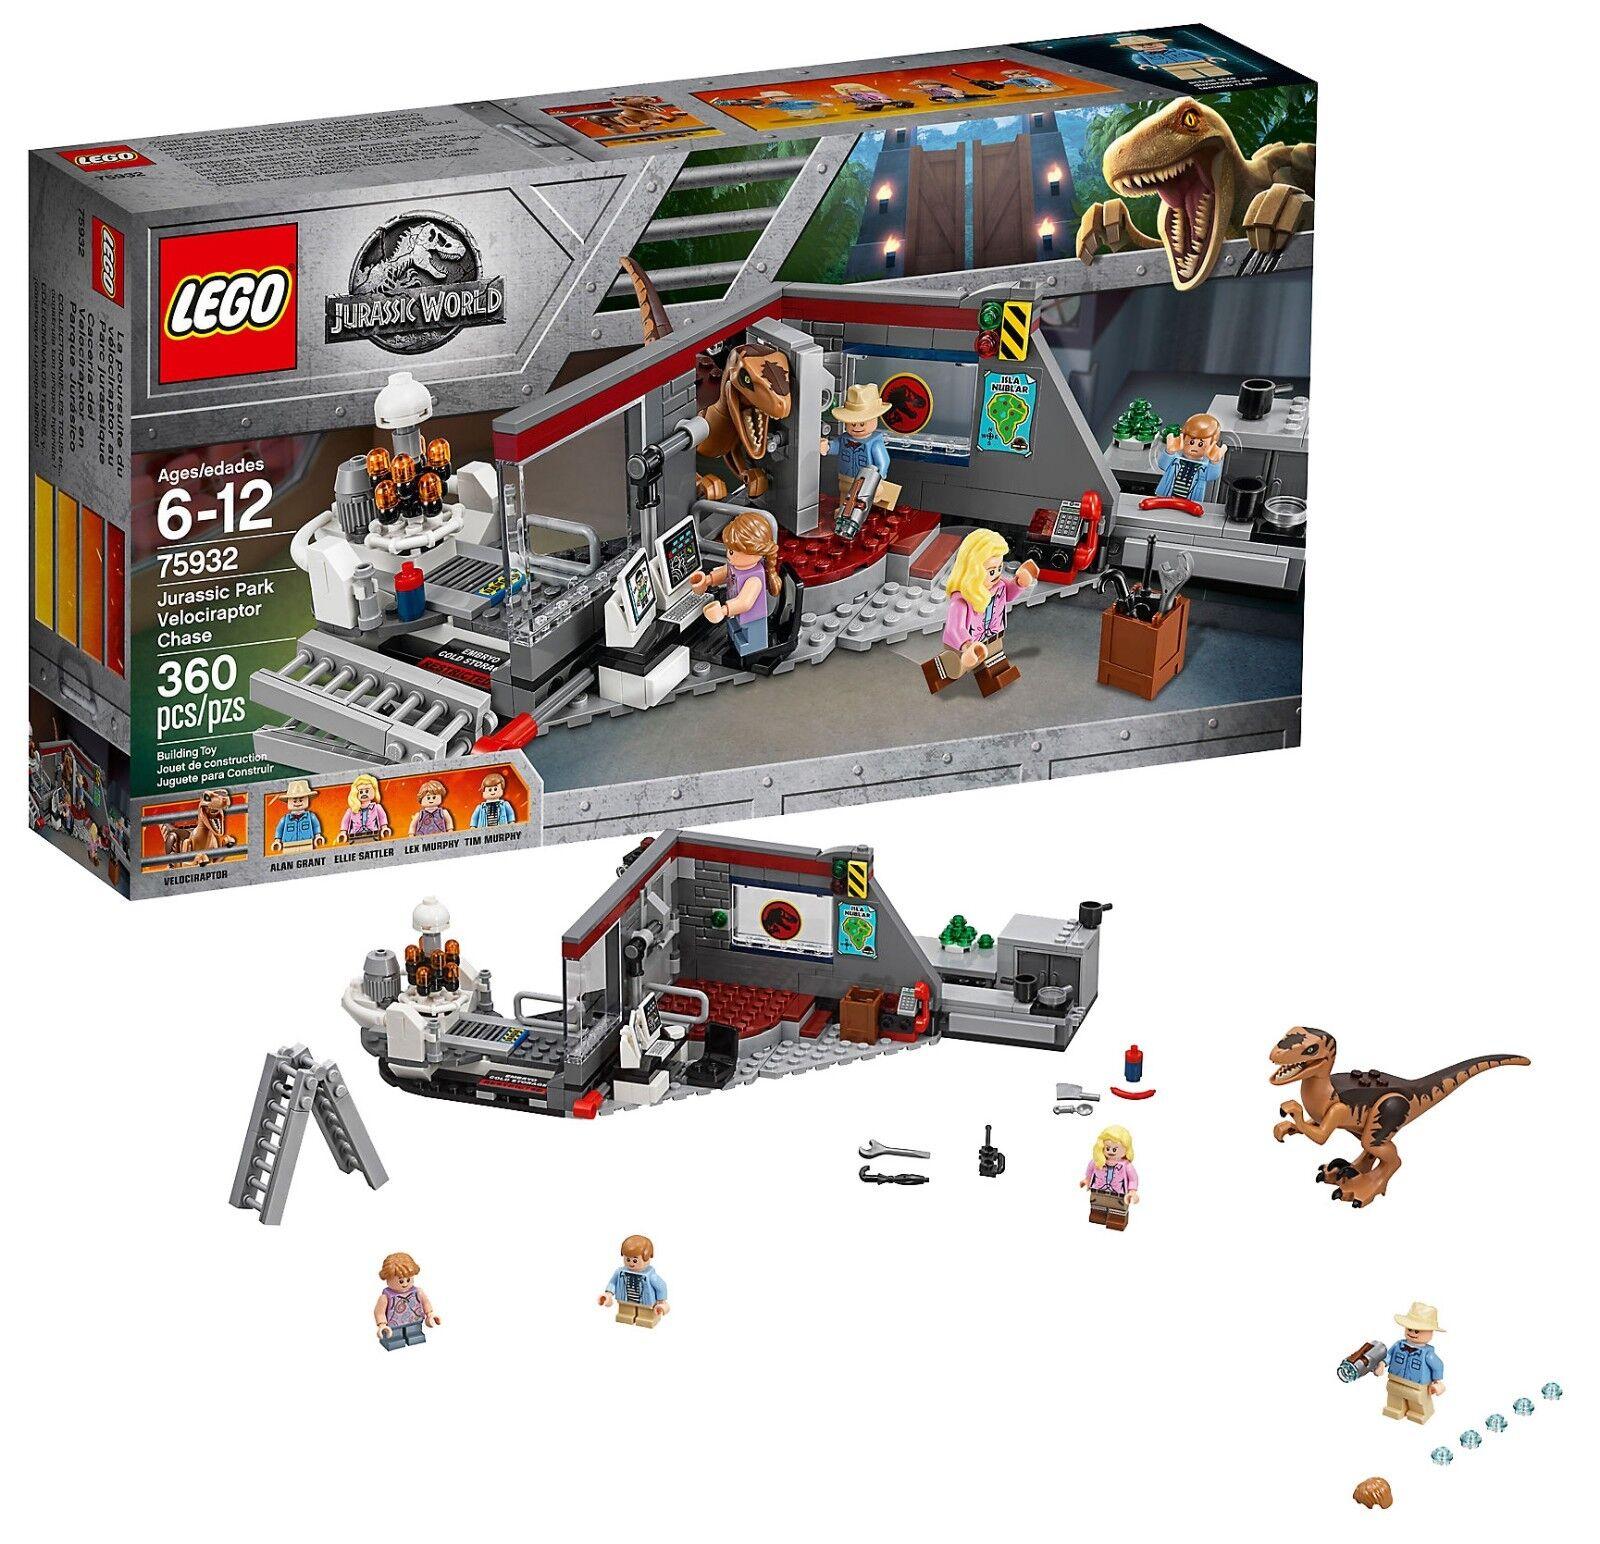 LEGO 75932 Jurassic World 2 Fallen Kingdom Velociraptor Chase 360pcs New Fast